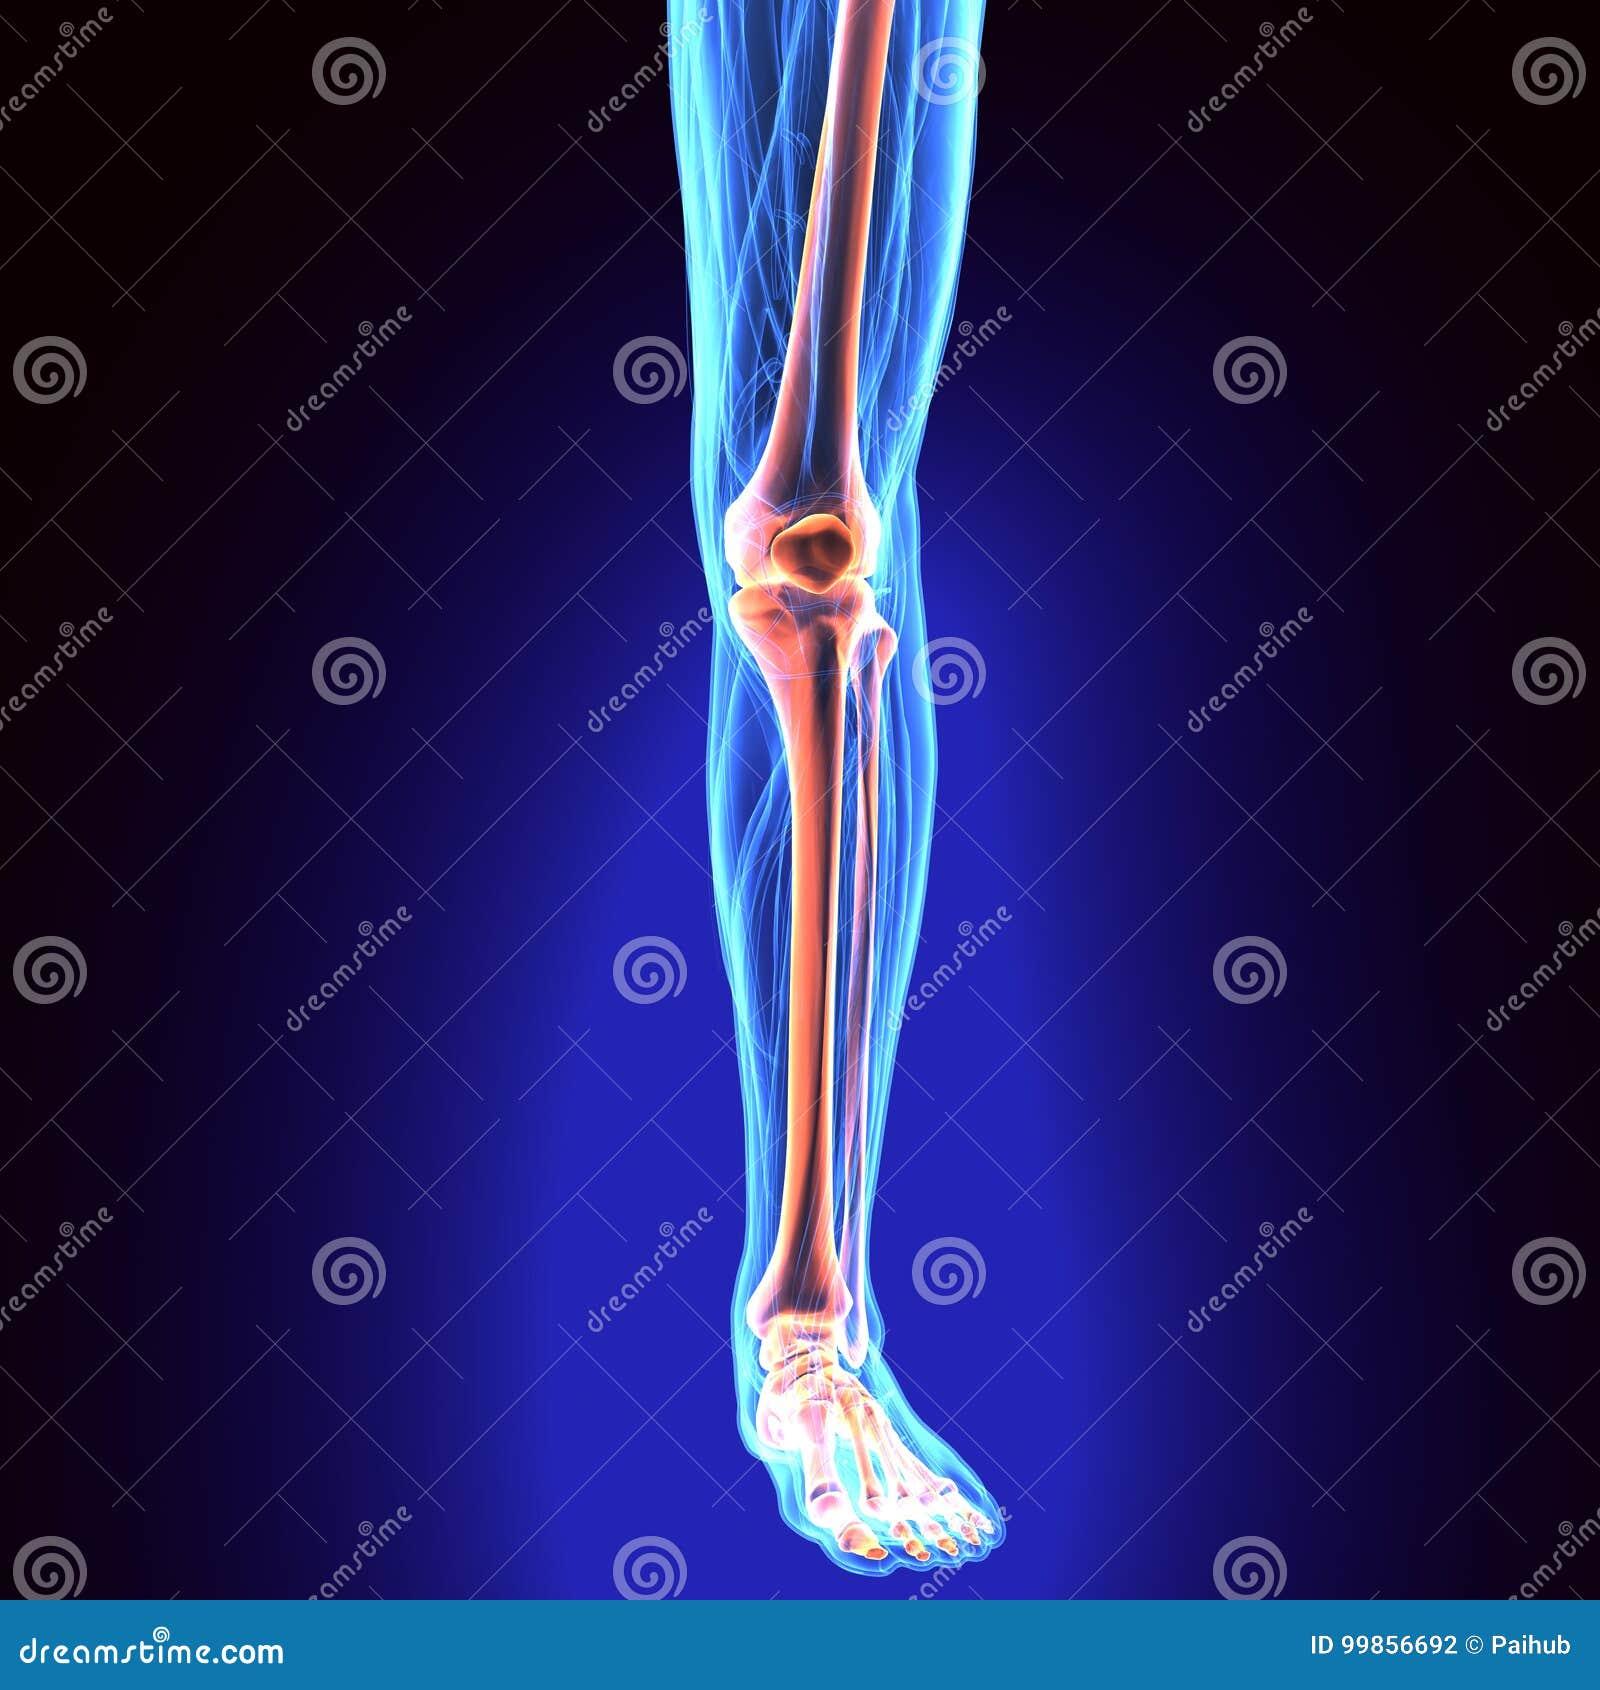 3D Illustration Of Tibia - Part Of Human Skeleton. Stock ...